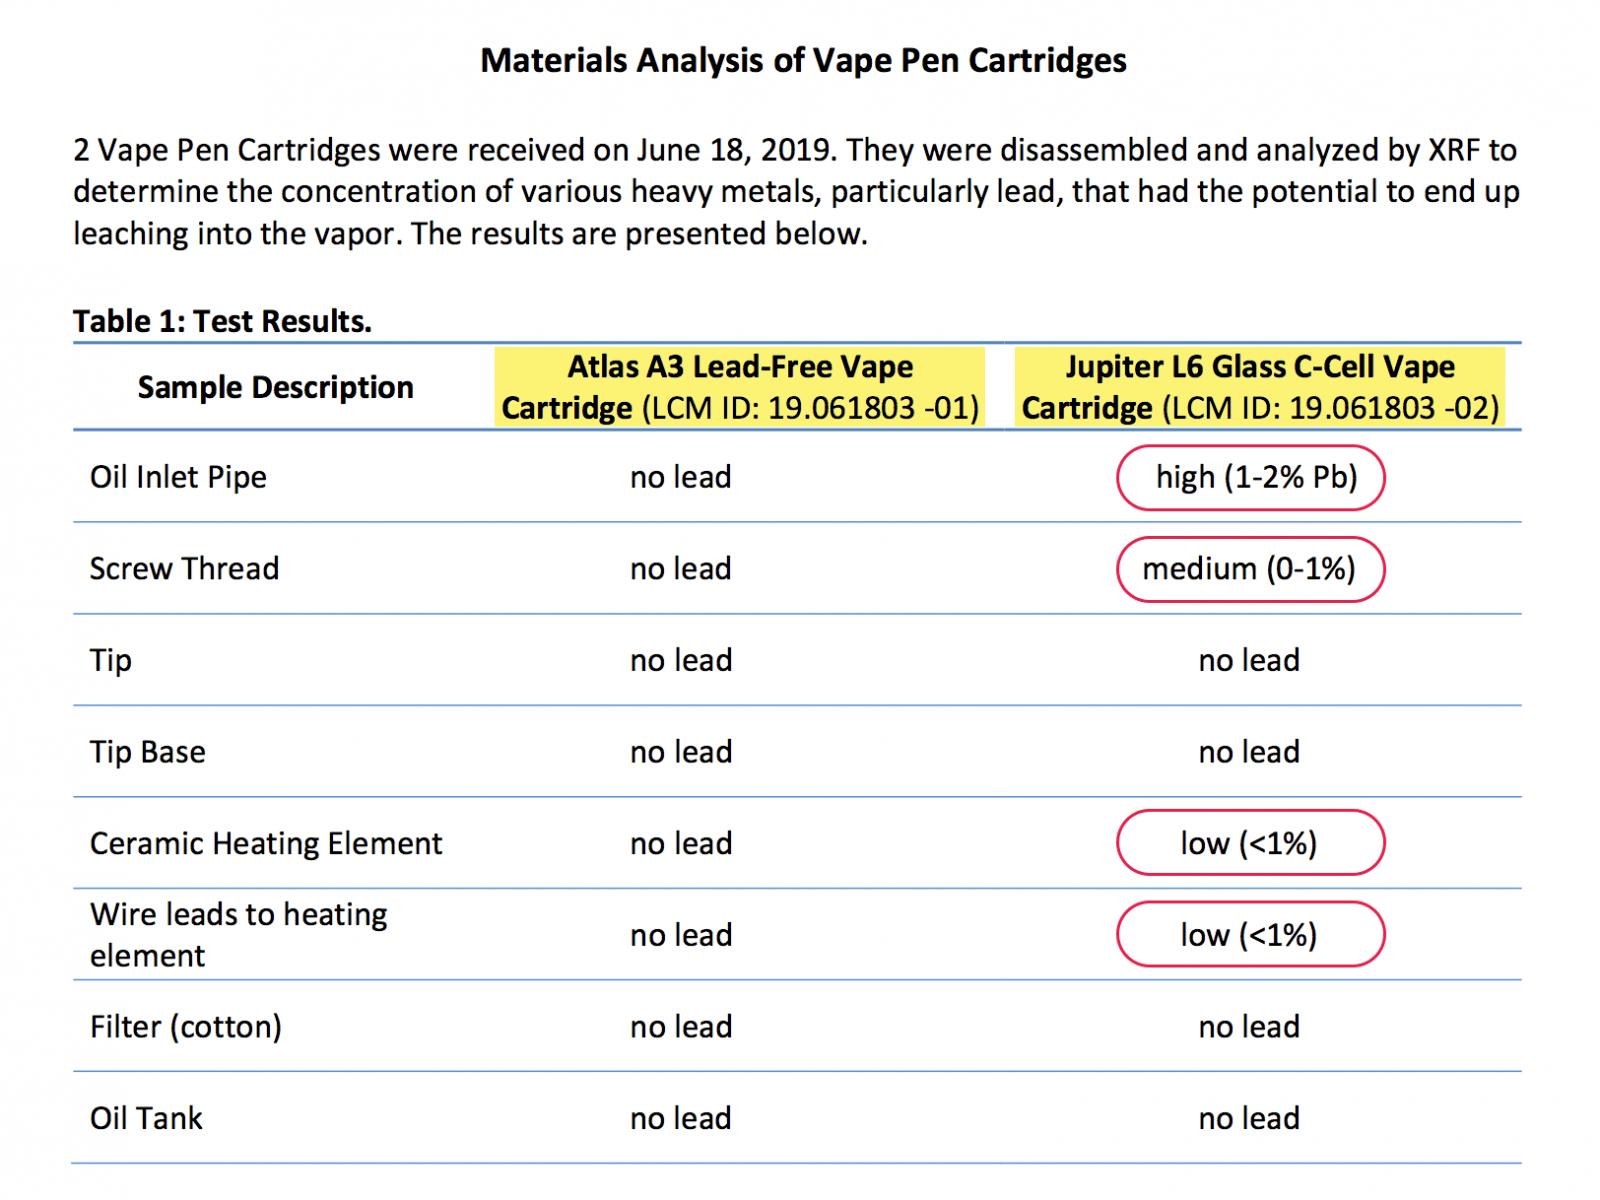 Materials Analysis of Vape Pen Cartridges